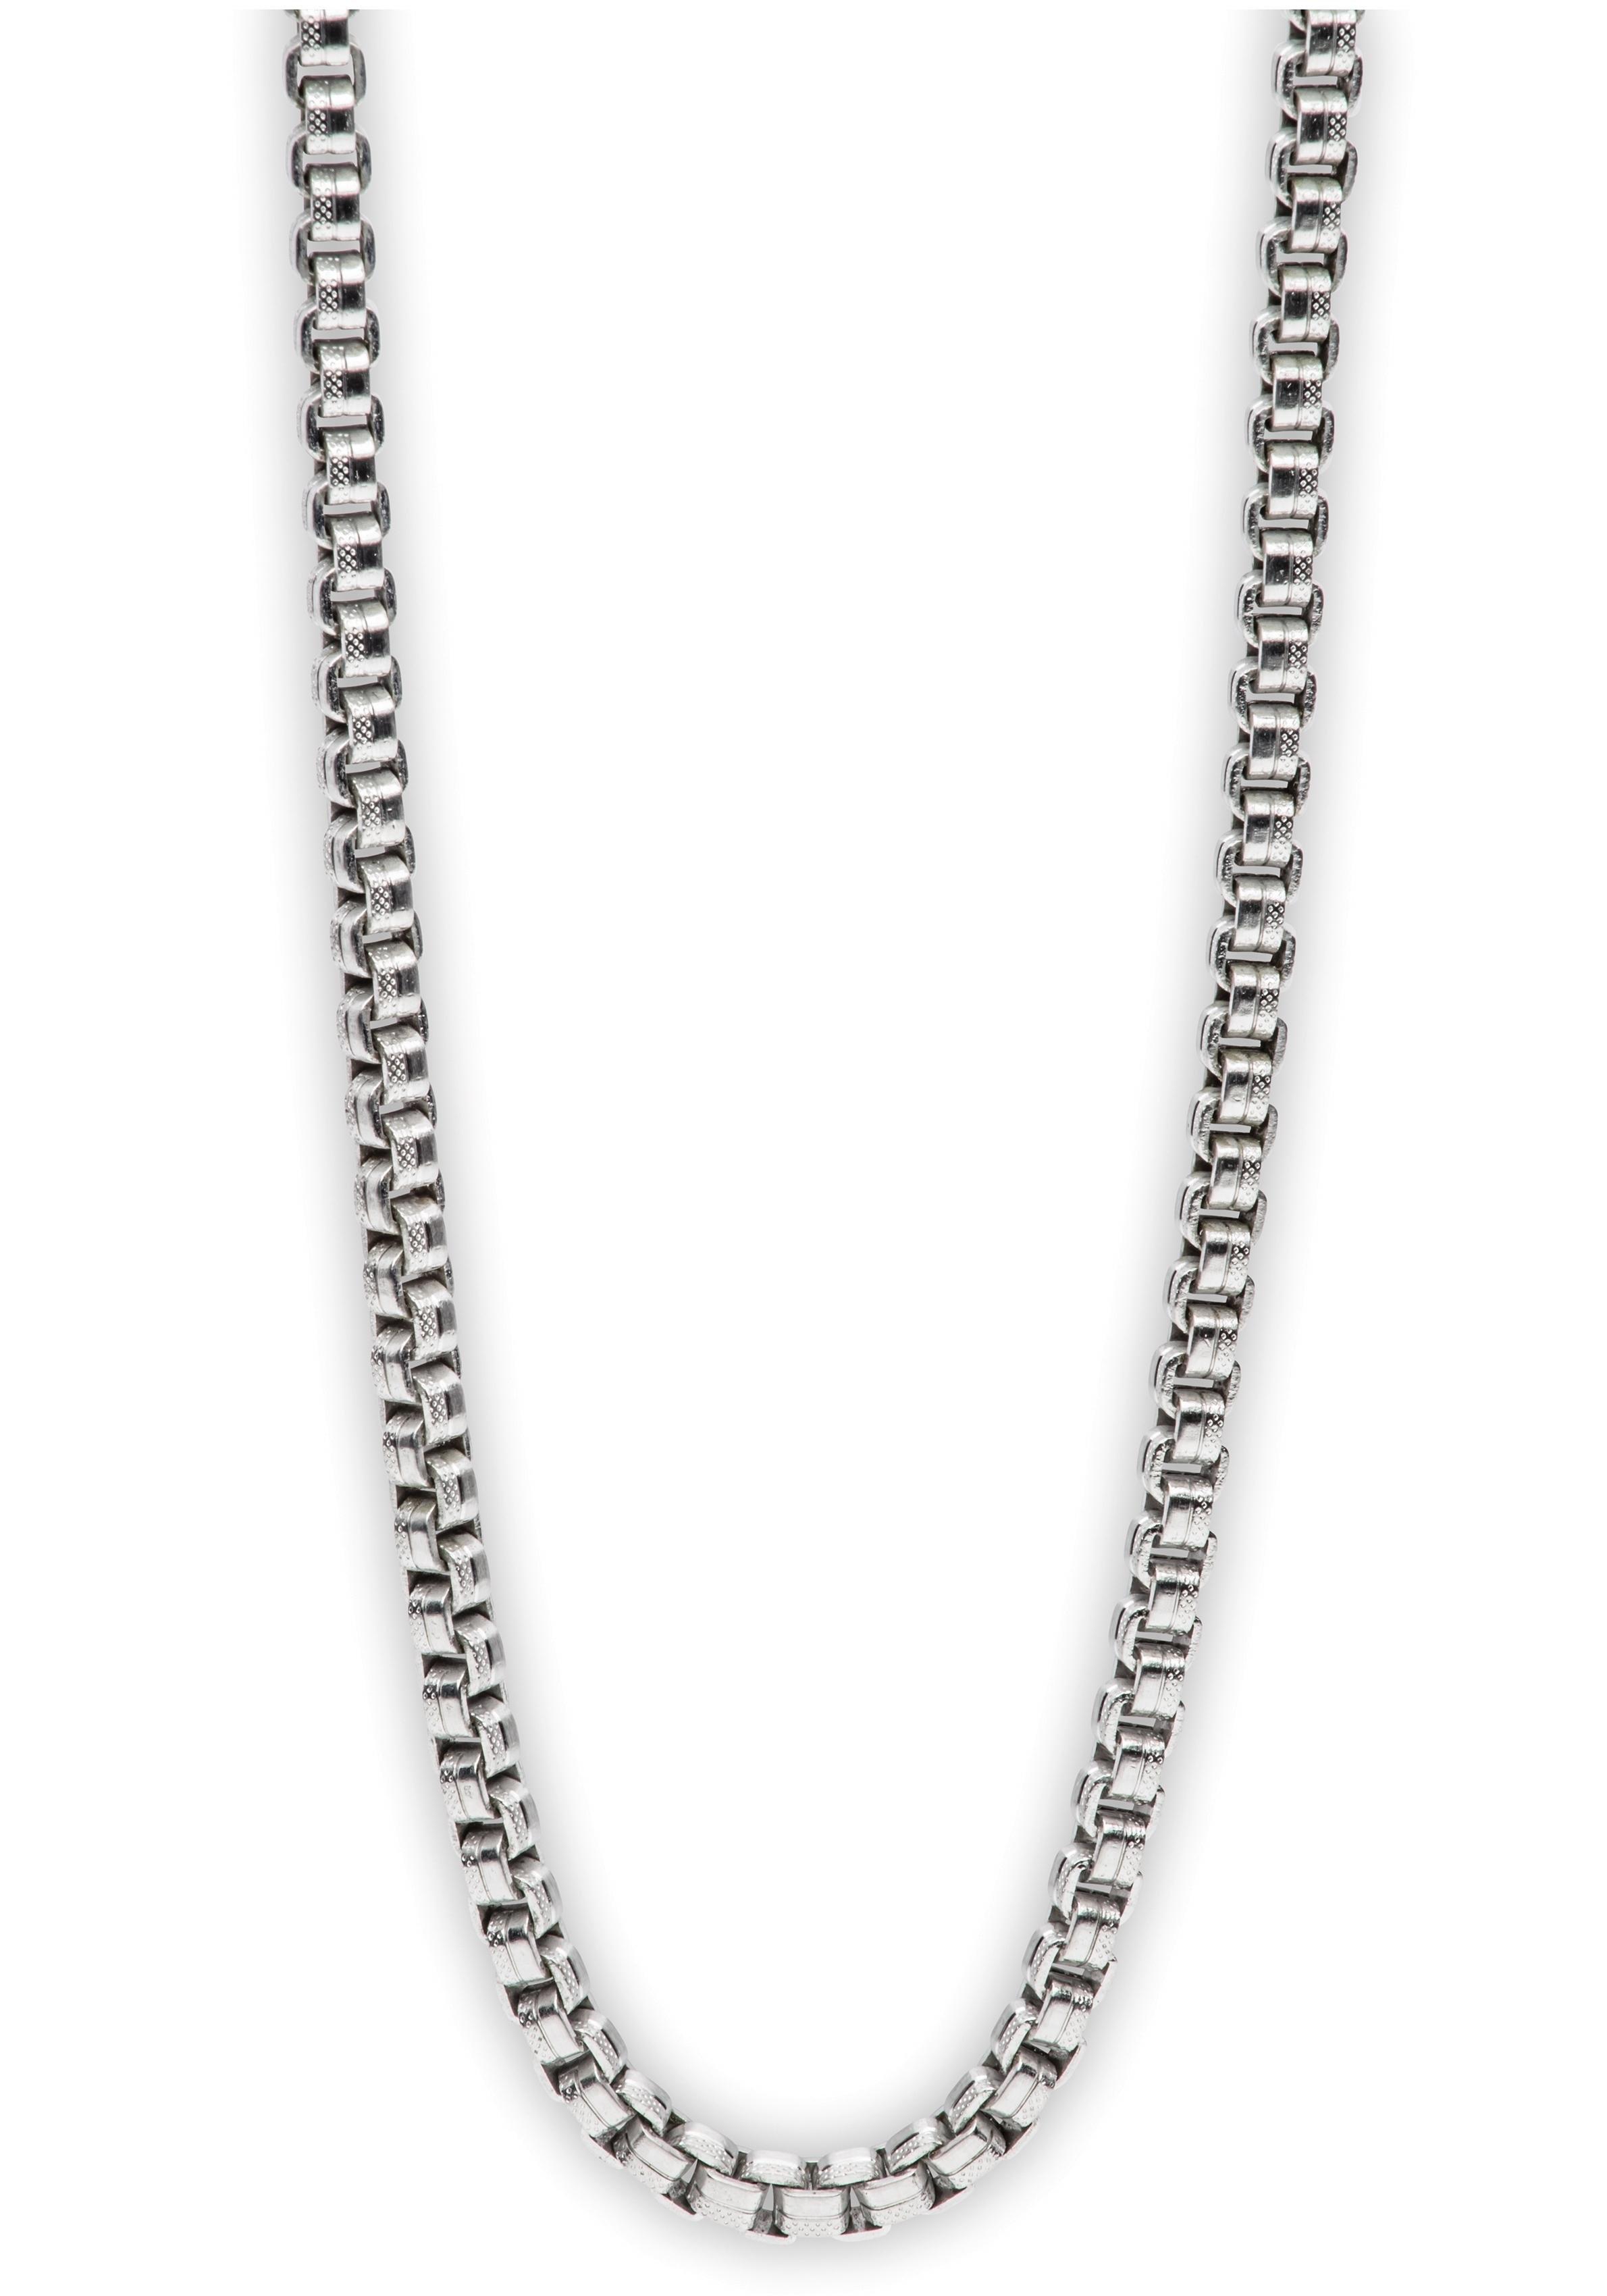 Steelwear edelstalen ketting »Salvador, SW-551« - verschillende betaalmethodes